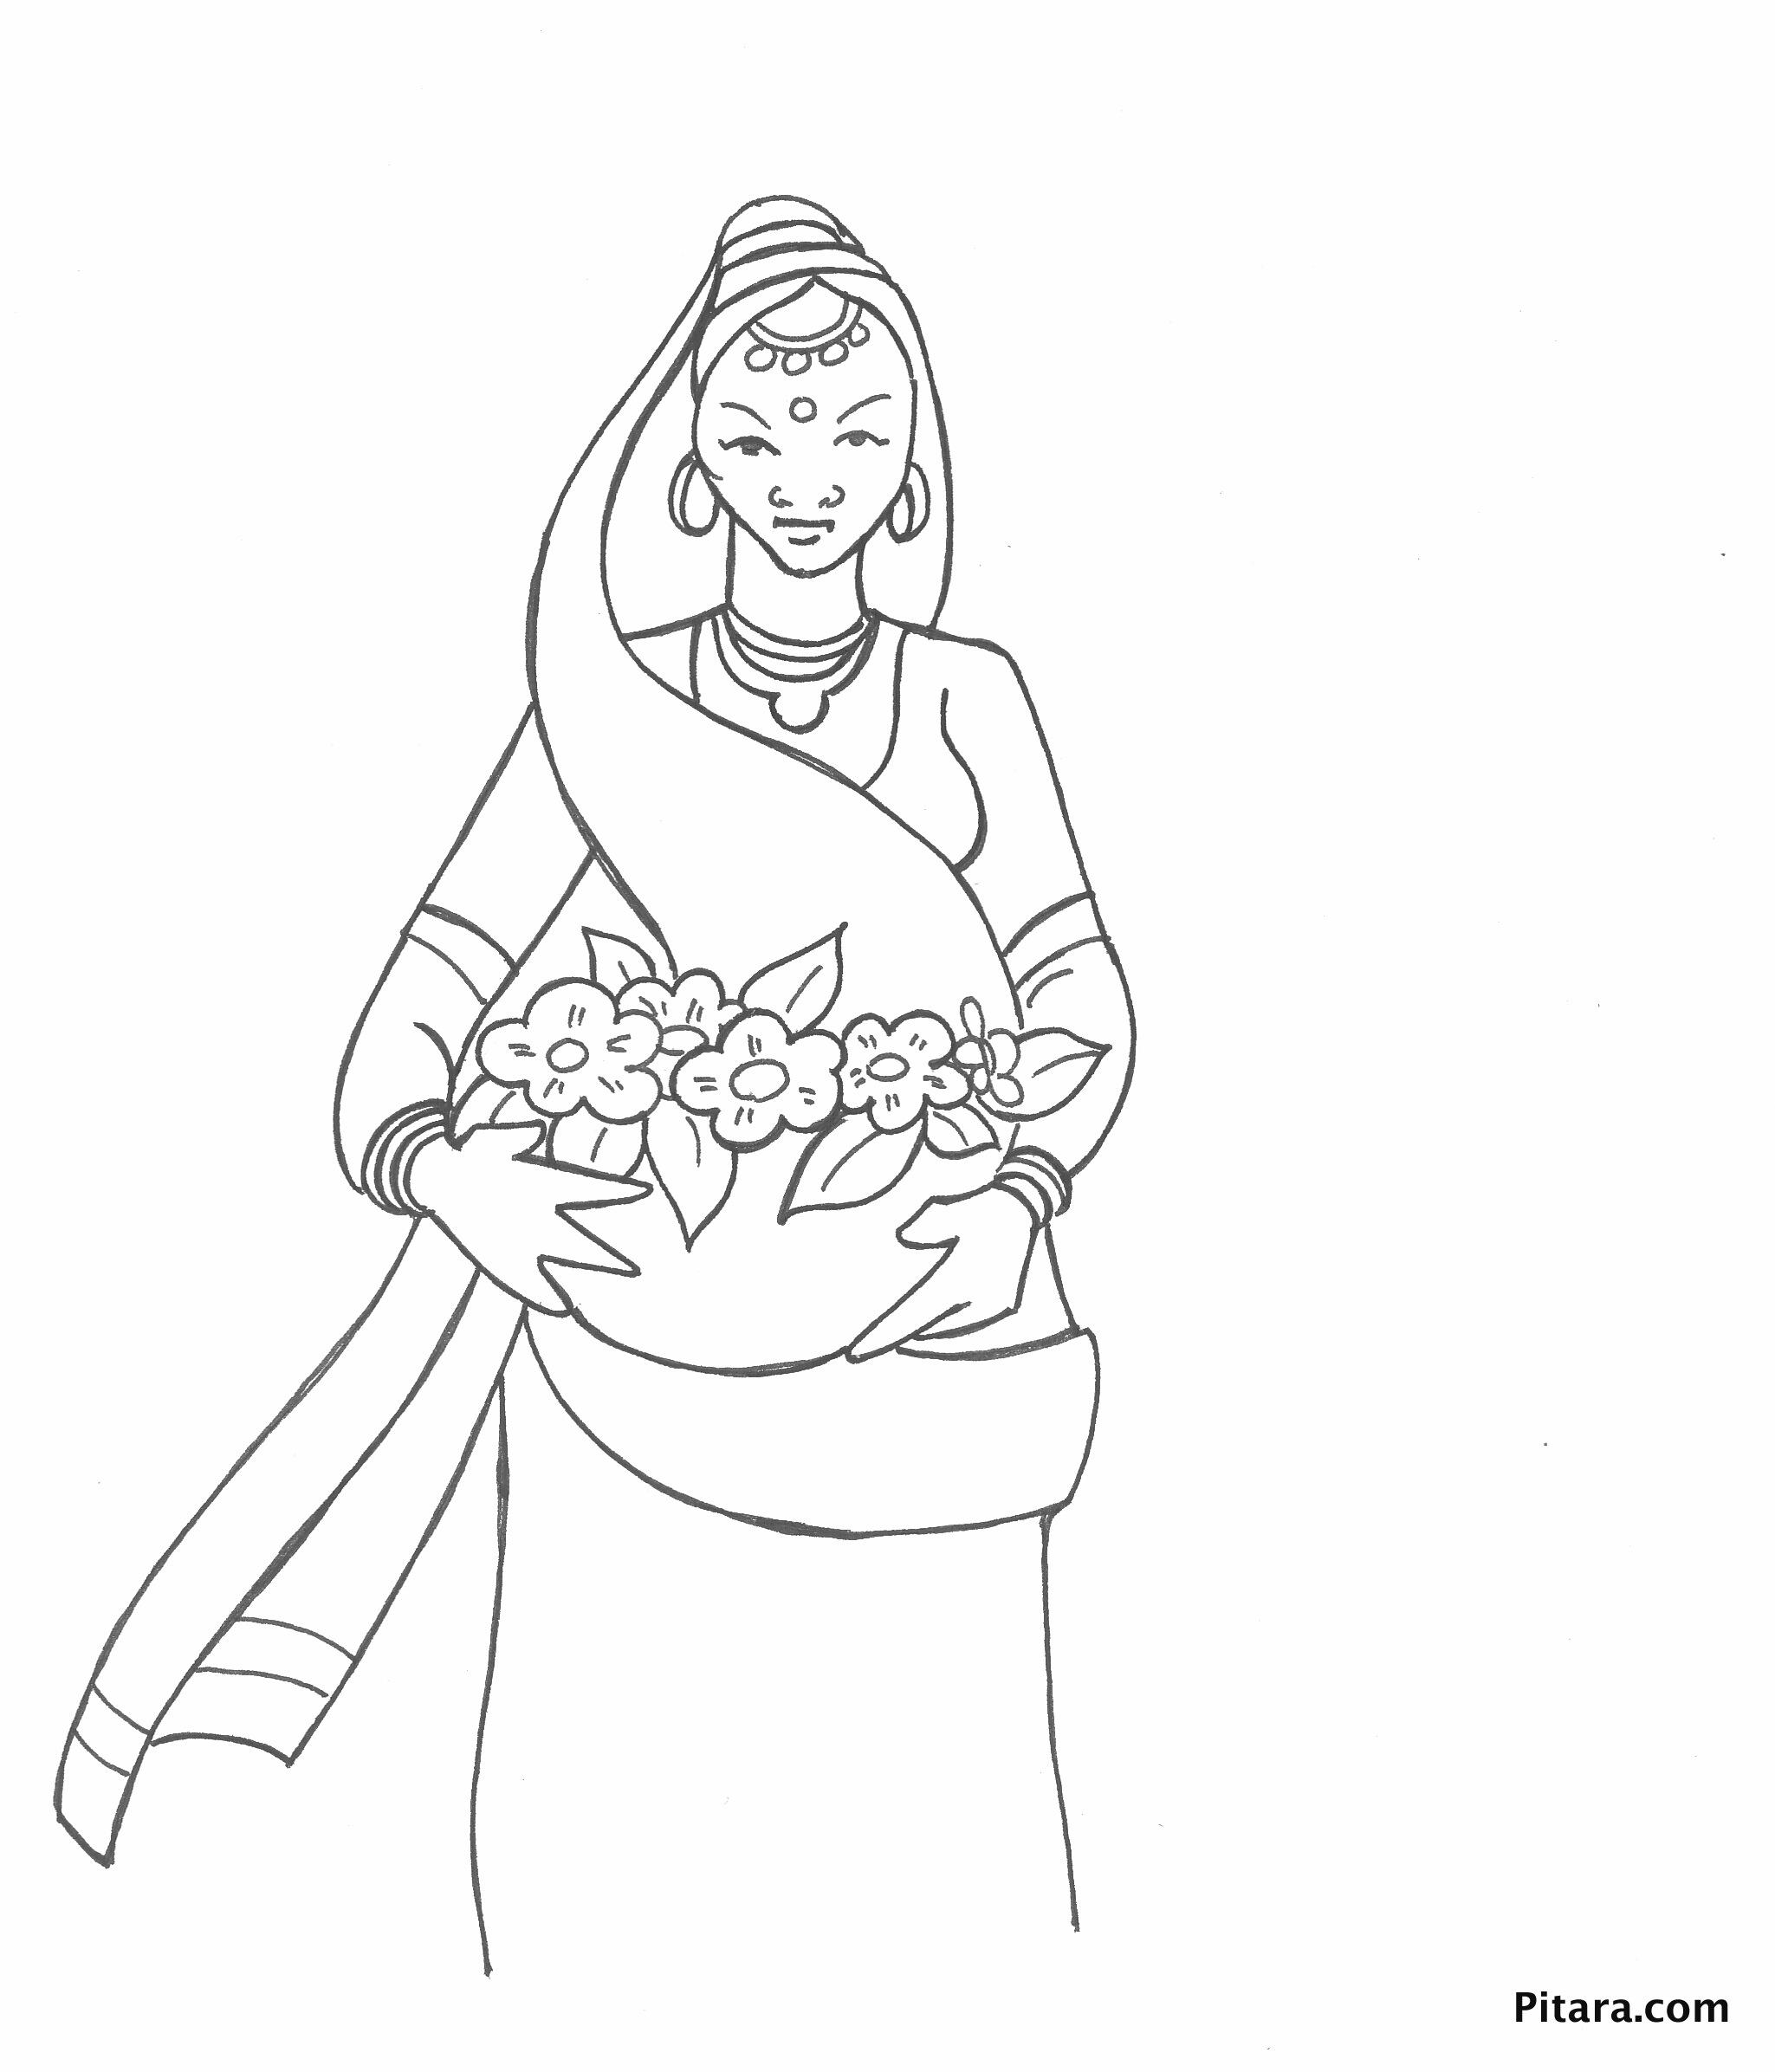 Woman selling flowers